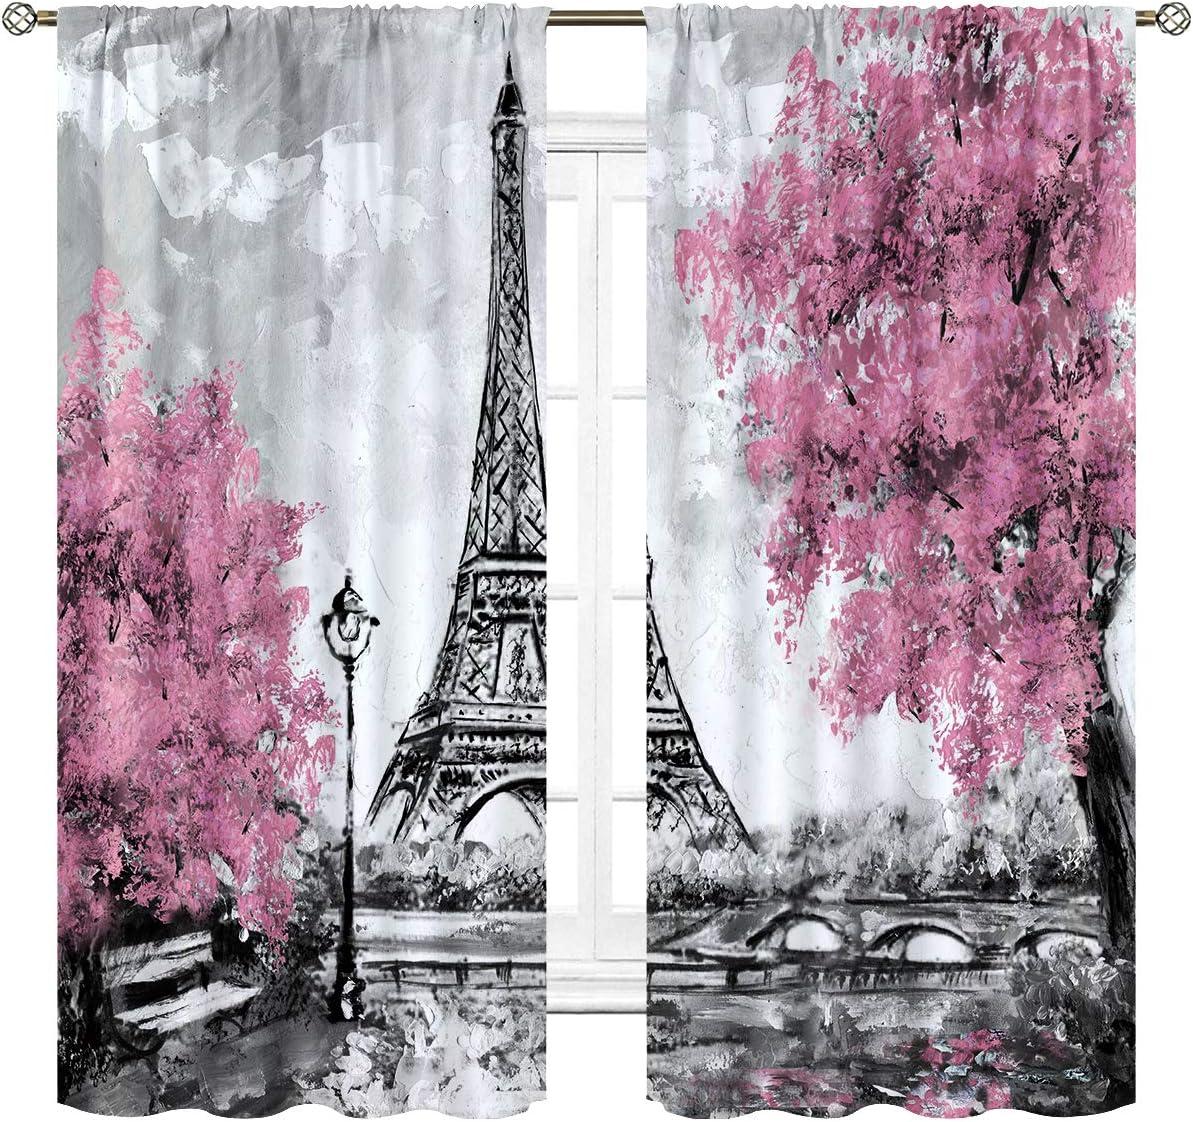 Cinblue Eiffel Tower Curtains Rod Pocket Paris Pink Trees Oil Painting European City Landscape France Art Printed Living Room Bedroom Window Drapes Treatment Fabric 2 Panels 42 (W) x 63(L) Inch